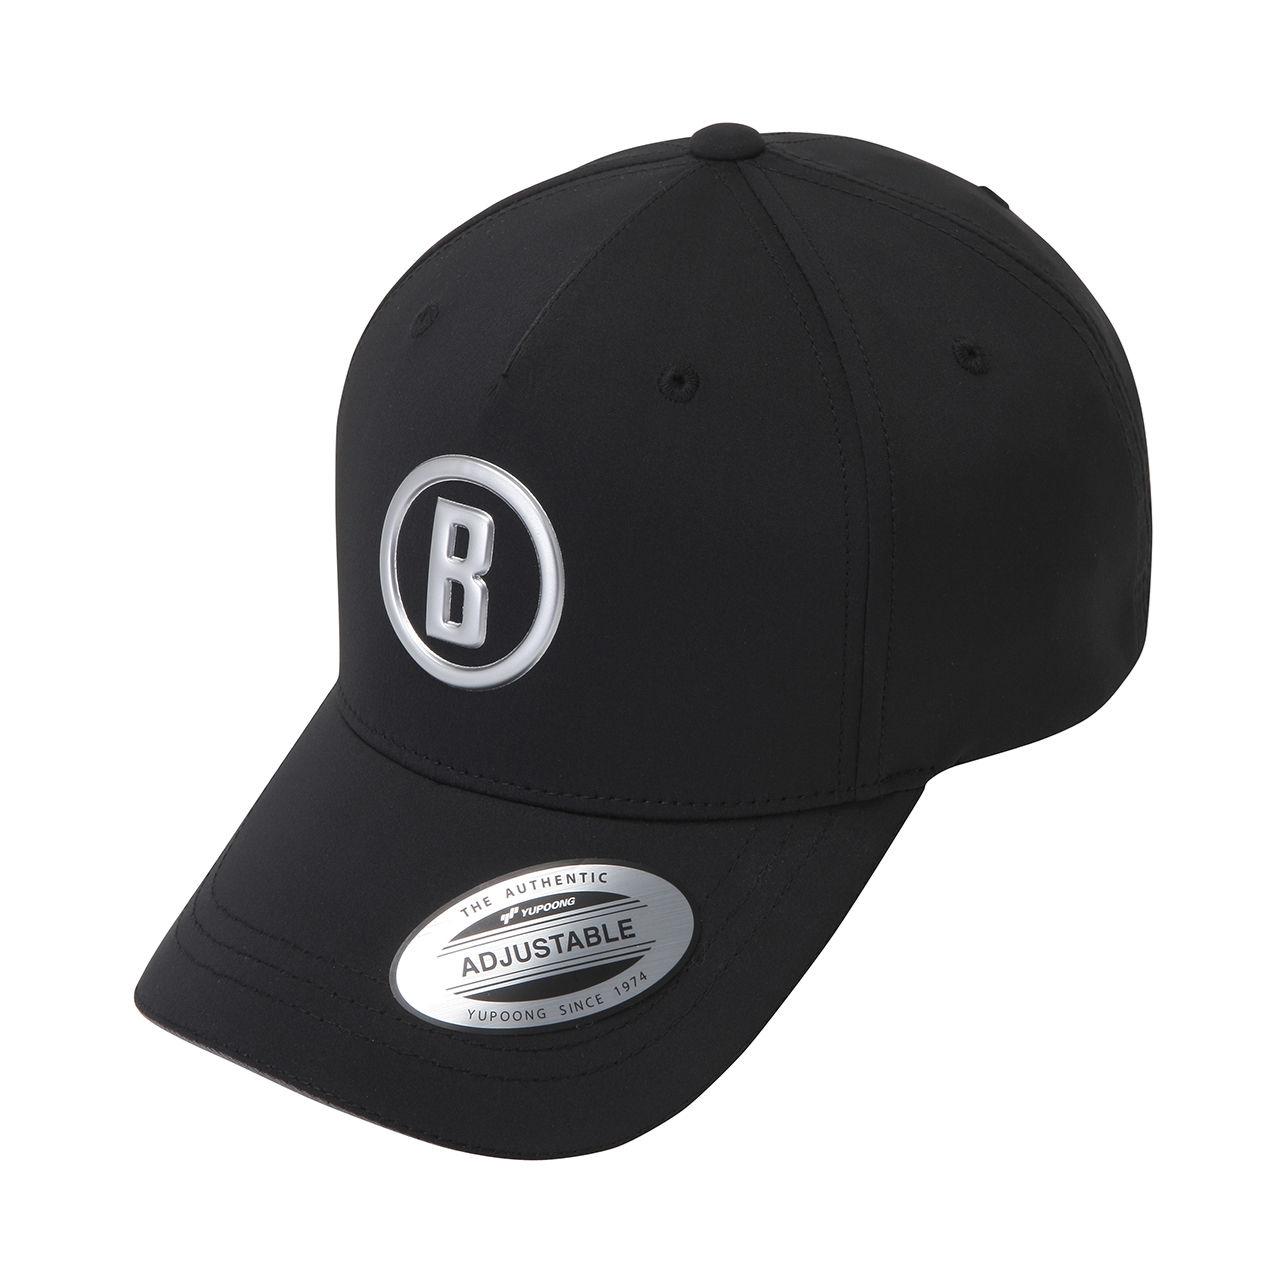 B LOGO STRUCLURED TOUR CAP 이미지 0